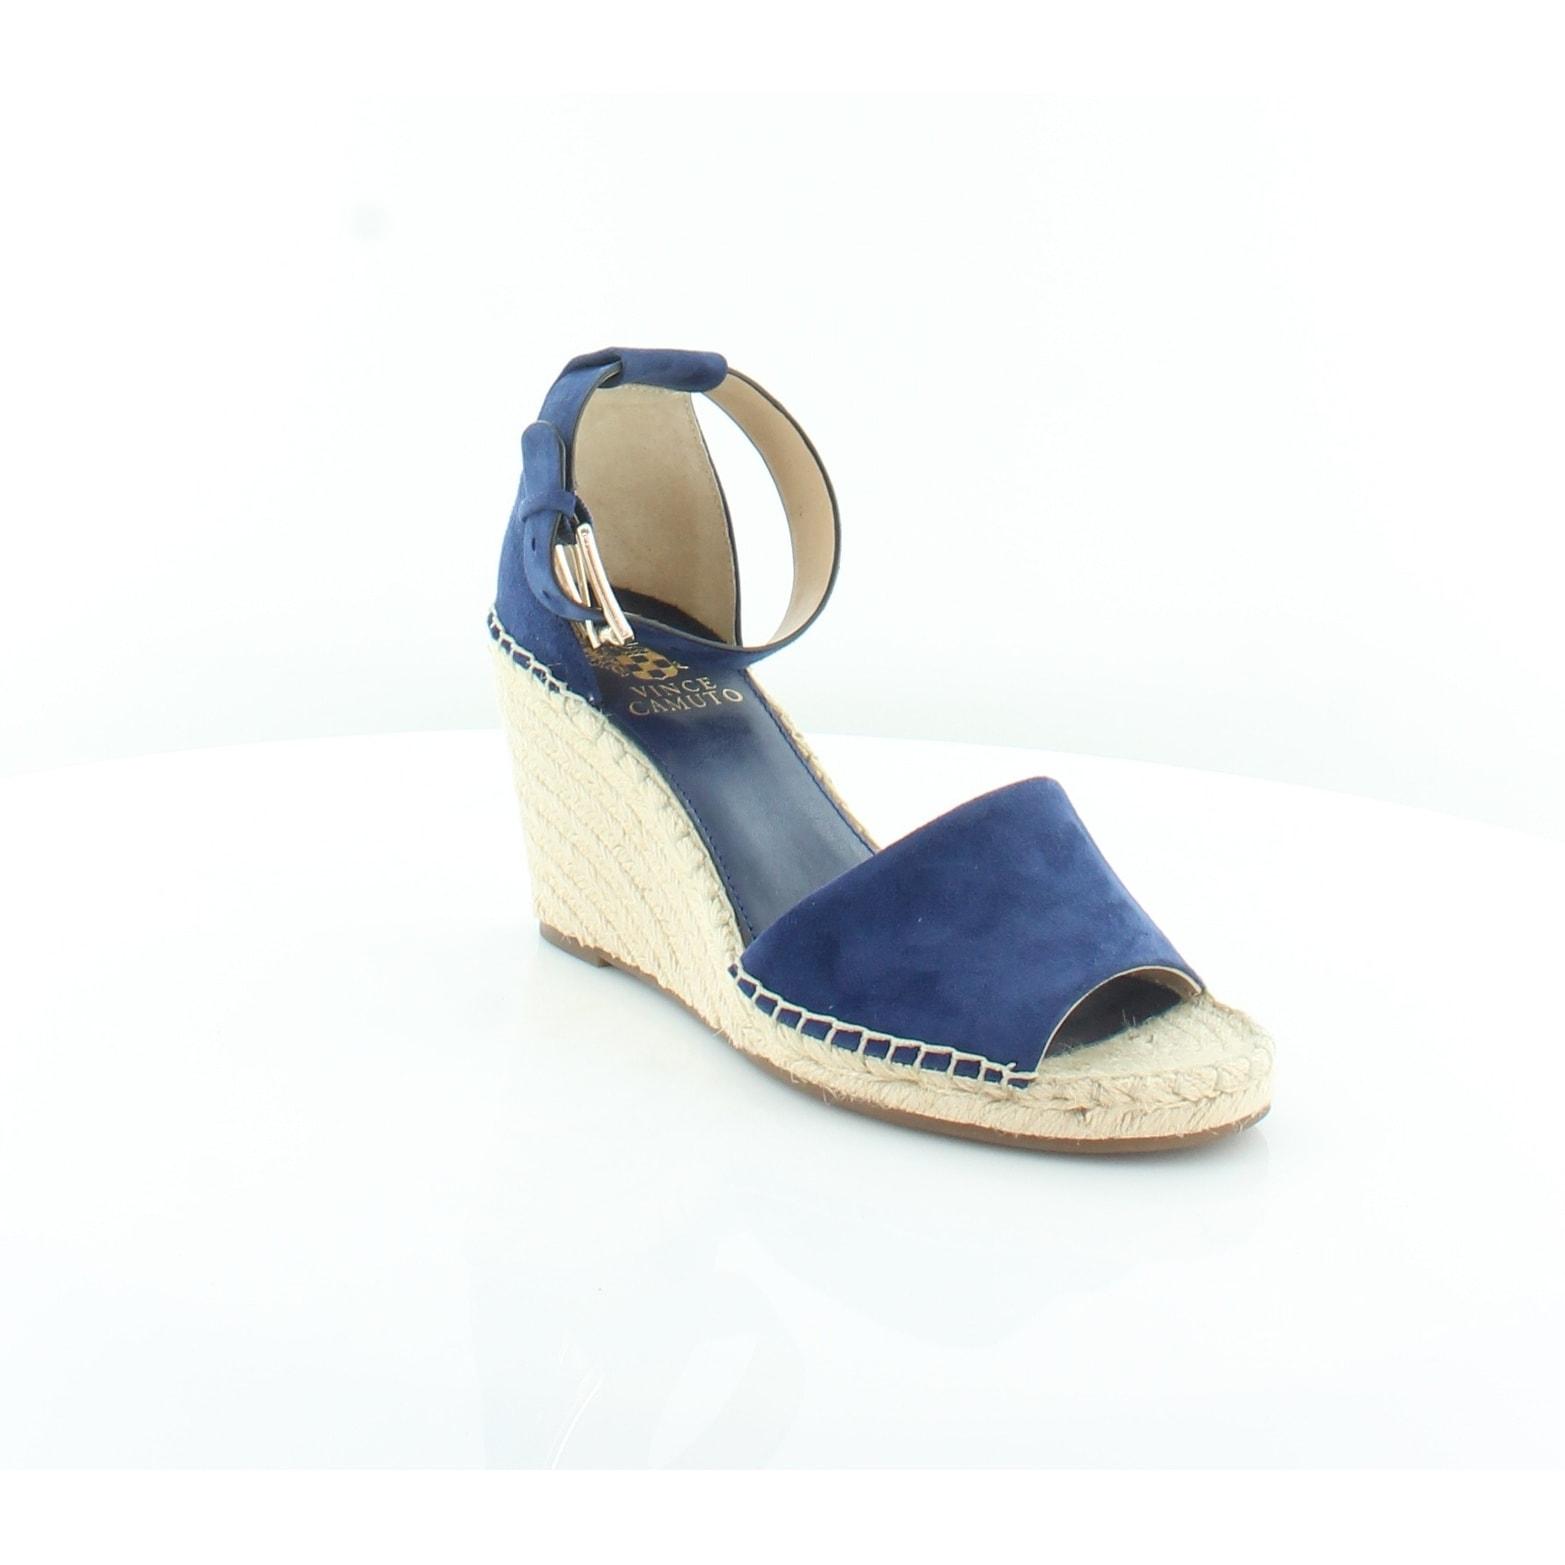 a76018b6280 Vince Camuto Leera Women's Sandals Moody Blues - 7